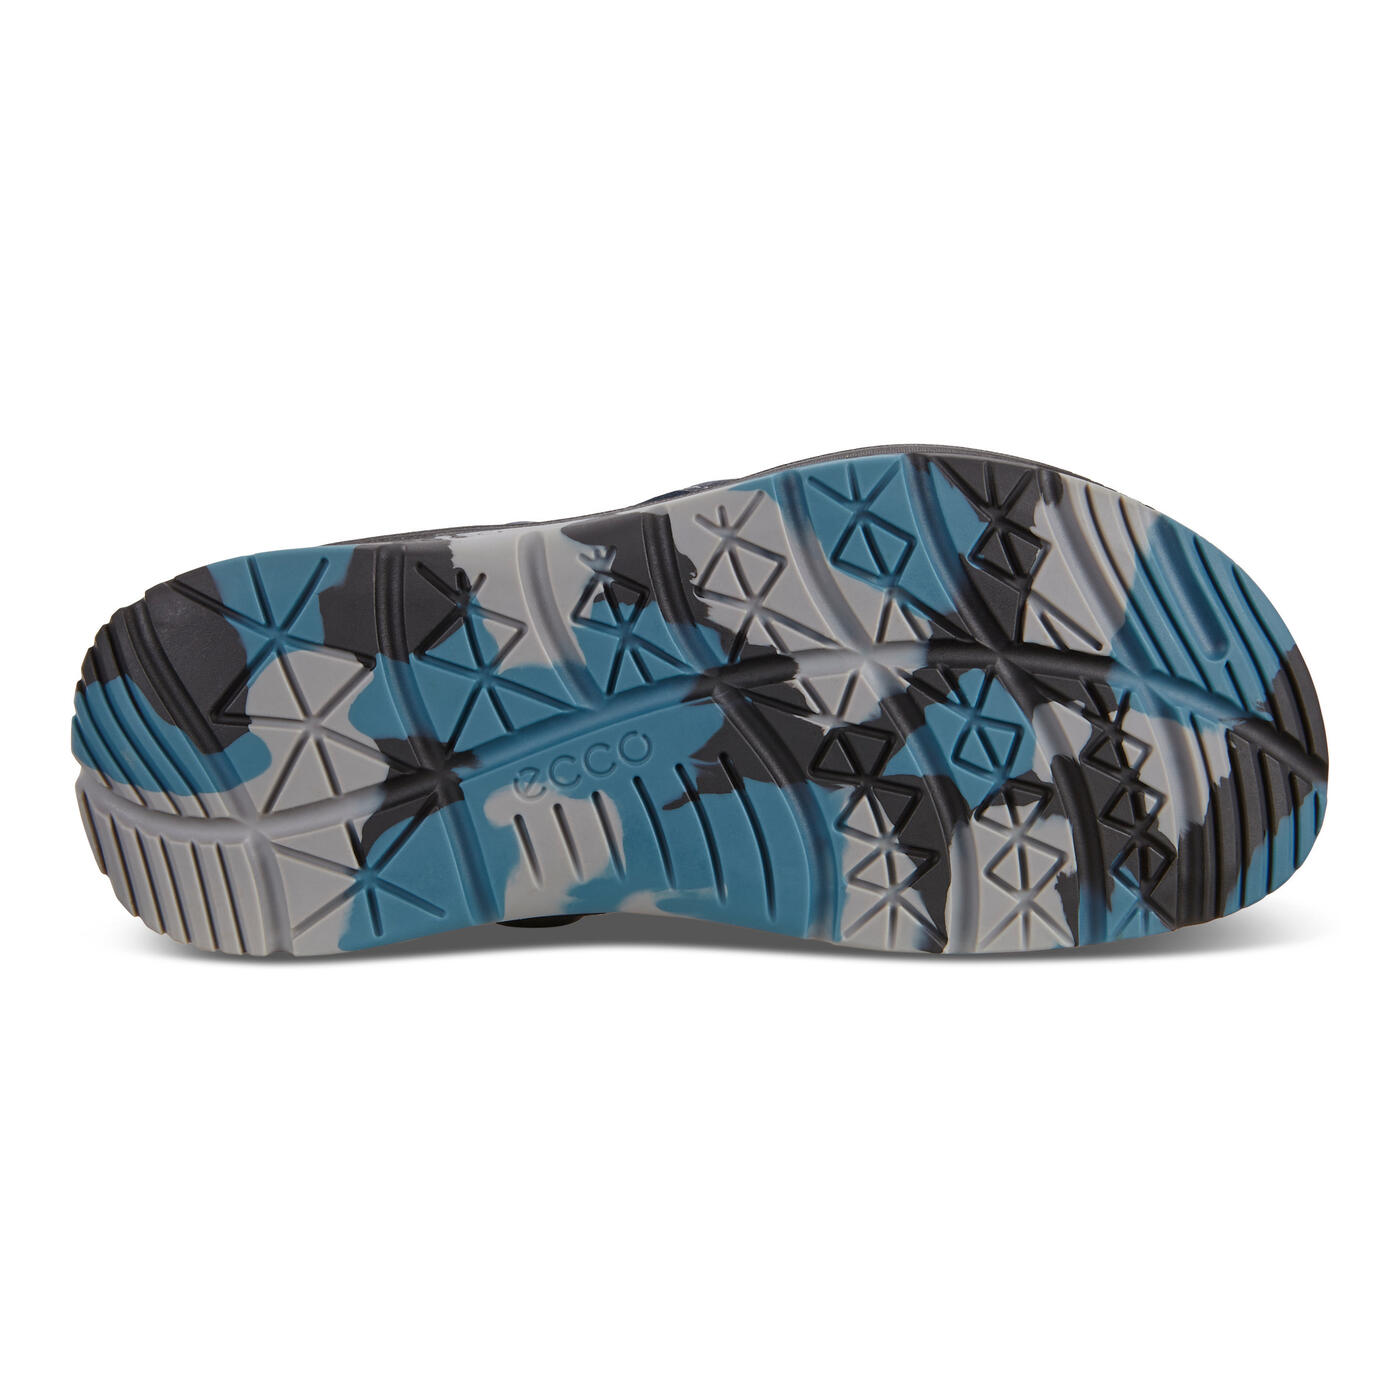 ECCO X-TRINSIC Mens Flat Sandal Leather Strap